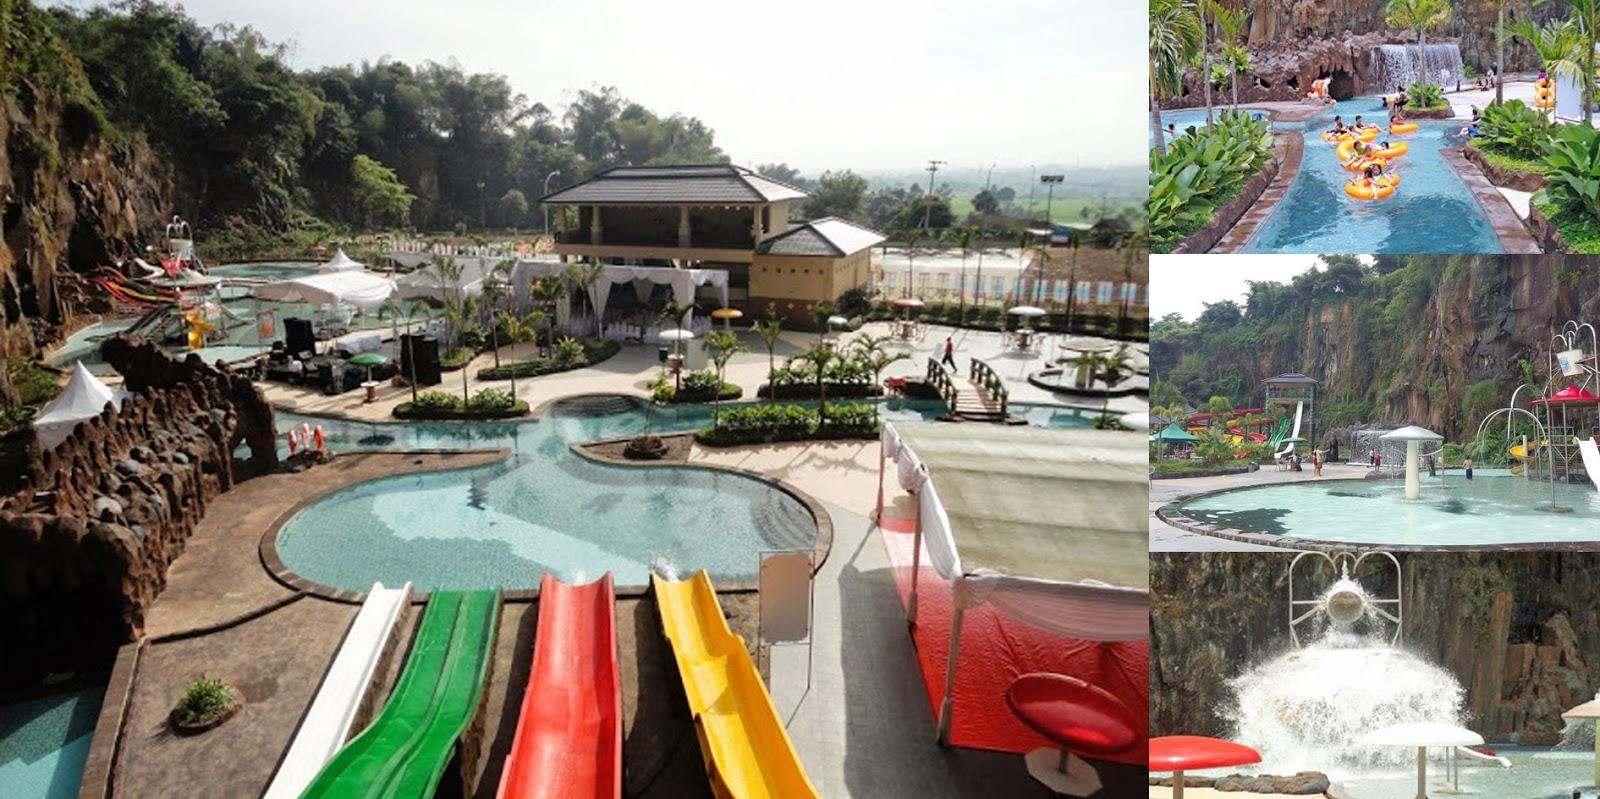 Wisata Renang Keluarga Pesona Nirwana Waterpark Soreang Kab Bandung Lokasi